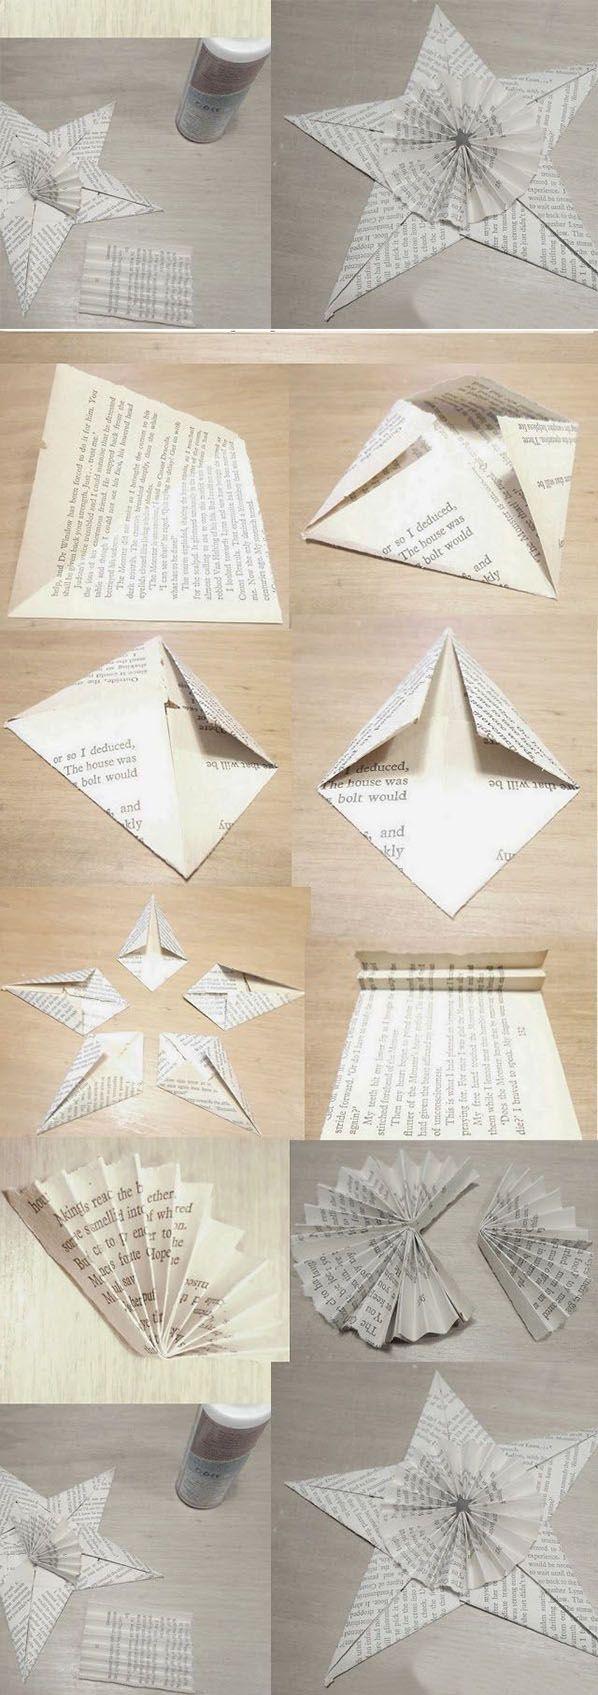 Easy Paper Star | DIY & Crafts Tutorials